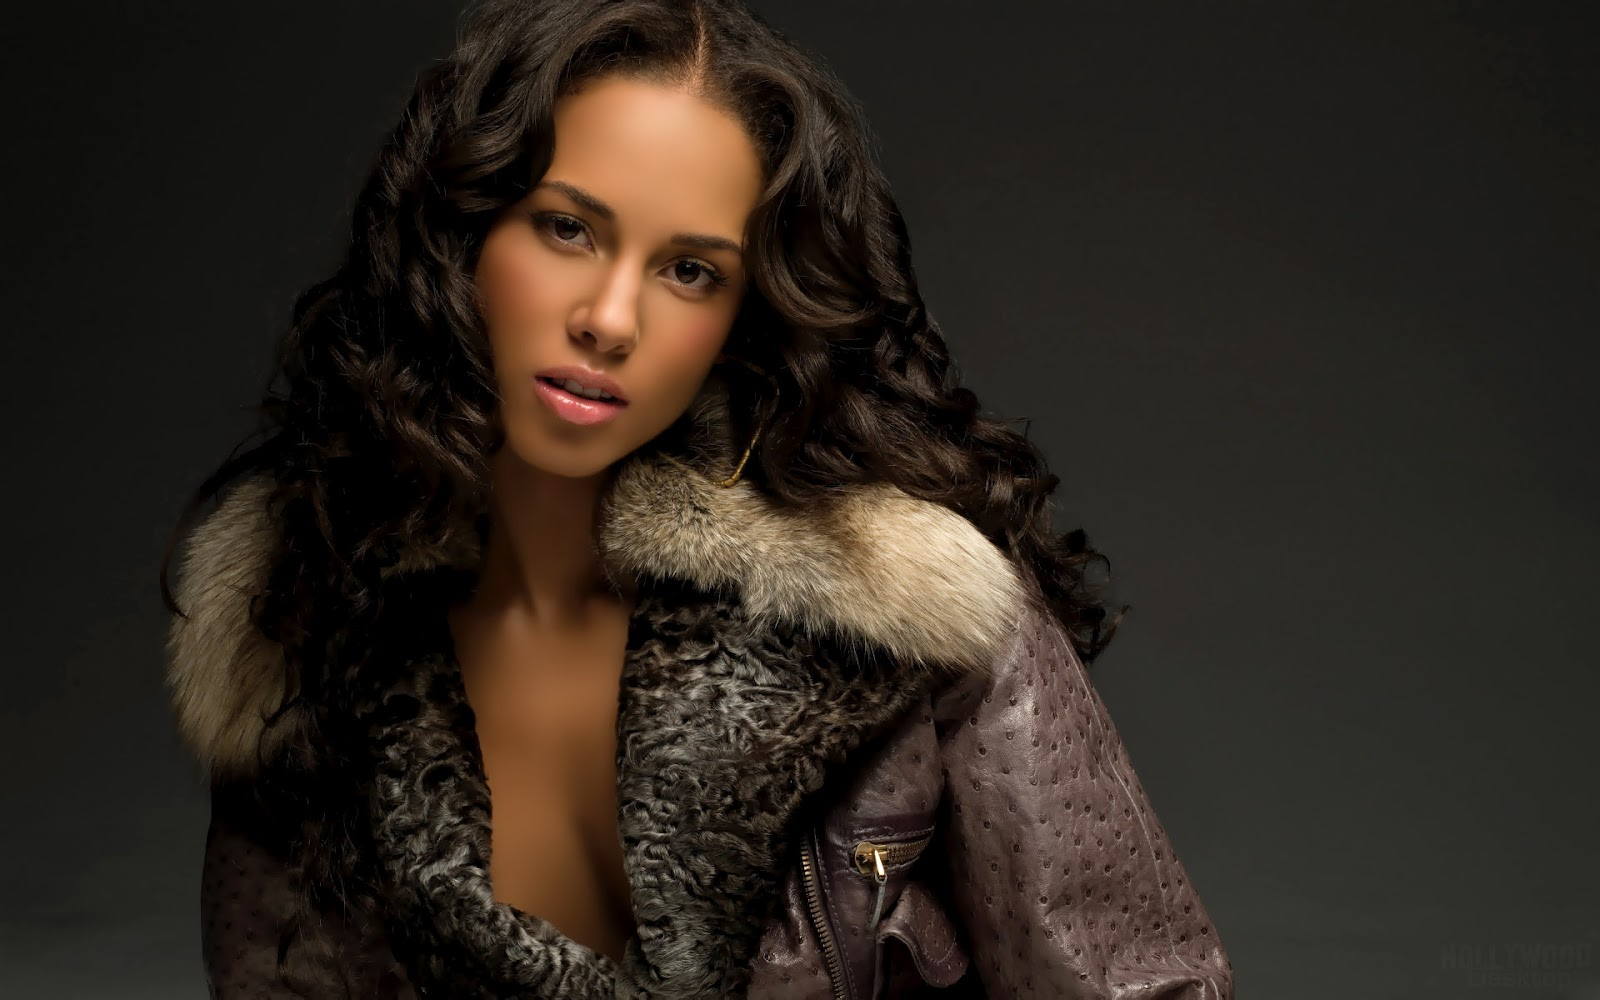 http://1.bp.blogspot.com/-oBJYEx1iOYY/TzRQxXSdftI/AAAAAAAAA0A/ZuKr2kbLfHU/s1600/Alicia+Keys+hot+looks+%282%29.jpg